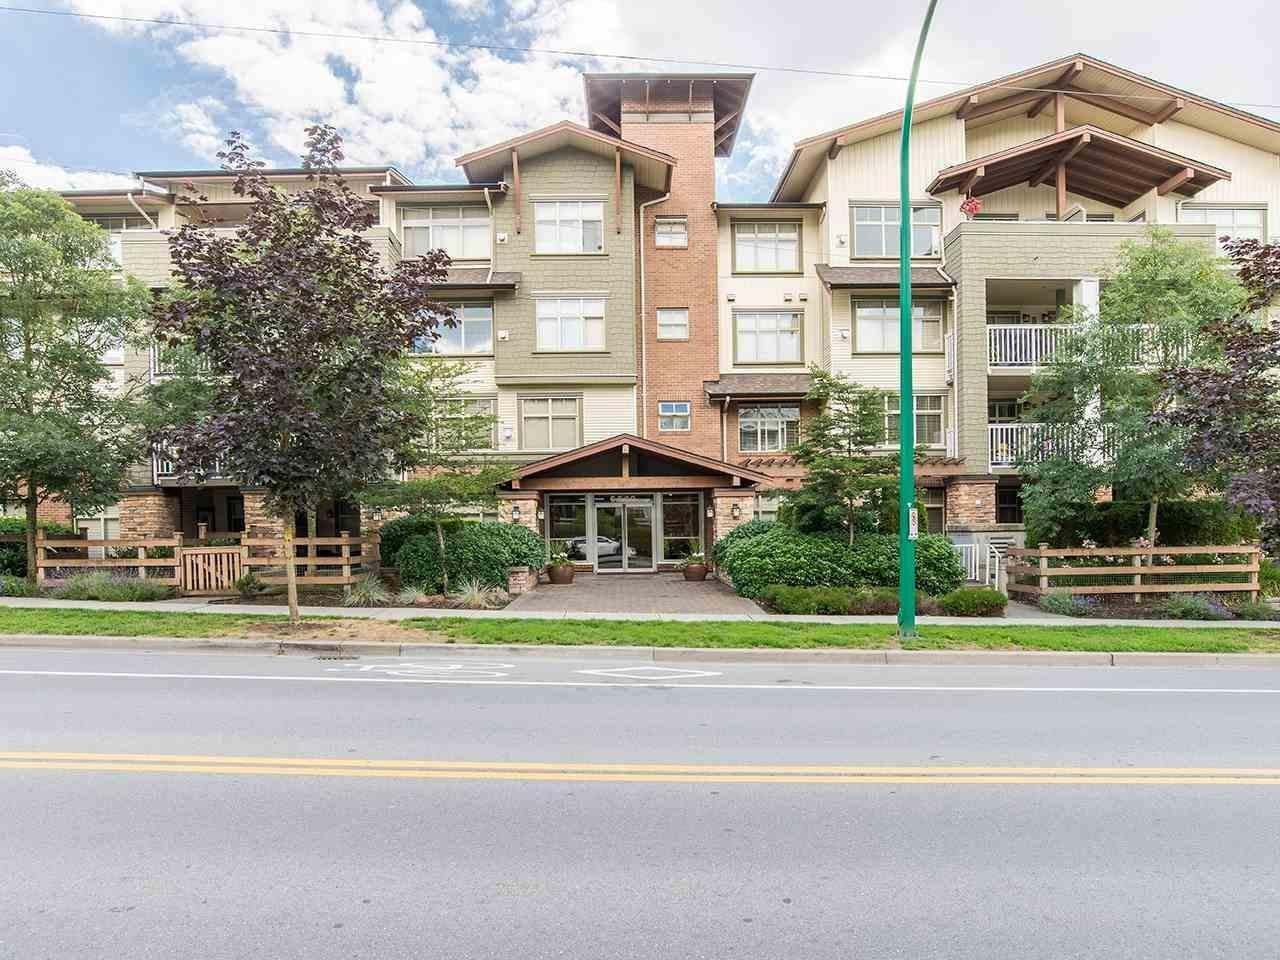 R2118450 - 316 6500 194 STREET, Clayton, Surrey, BC - Apartment Unit